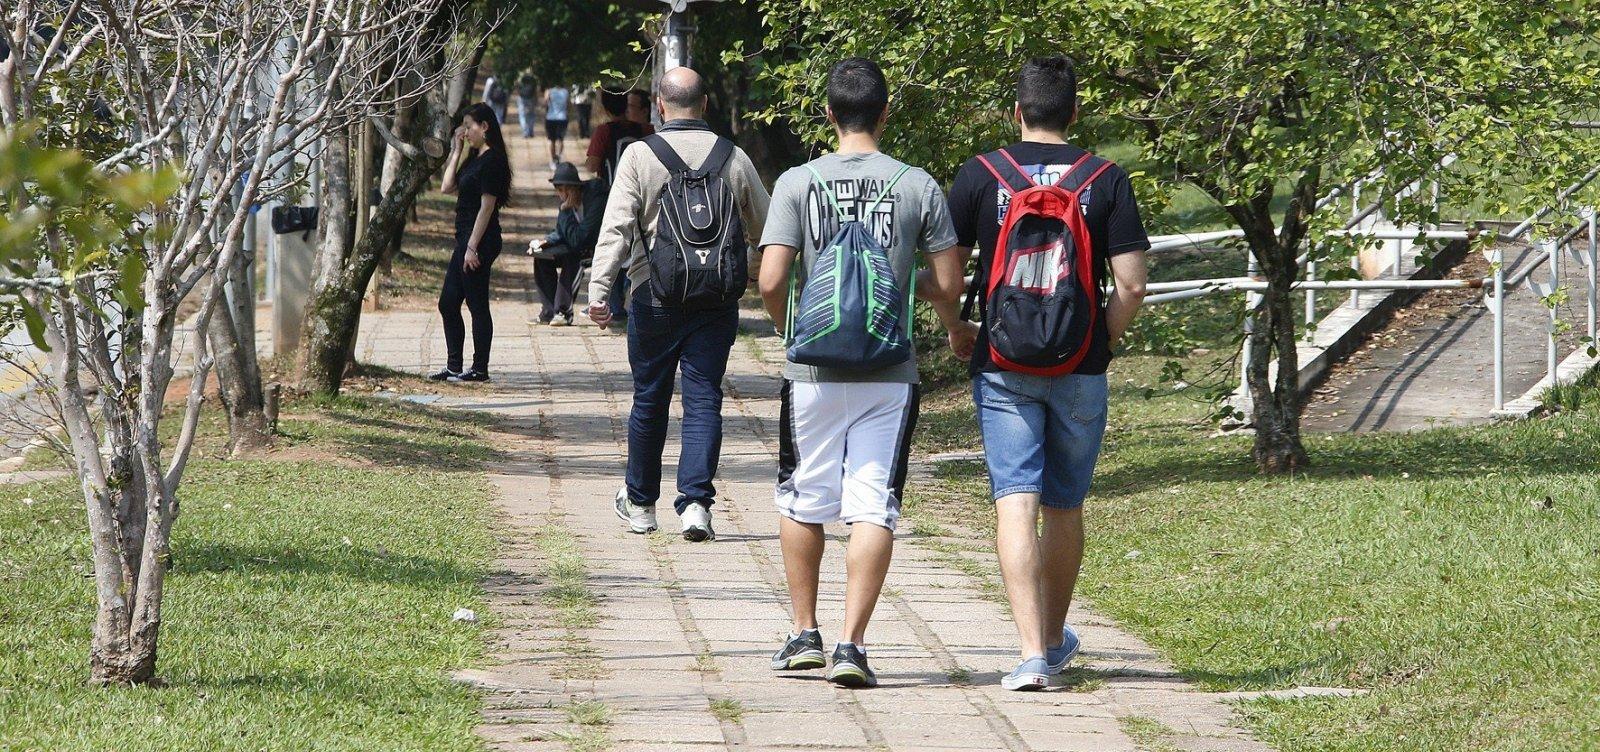 Cresce número de estudantes do ensino superior na Bahia